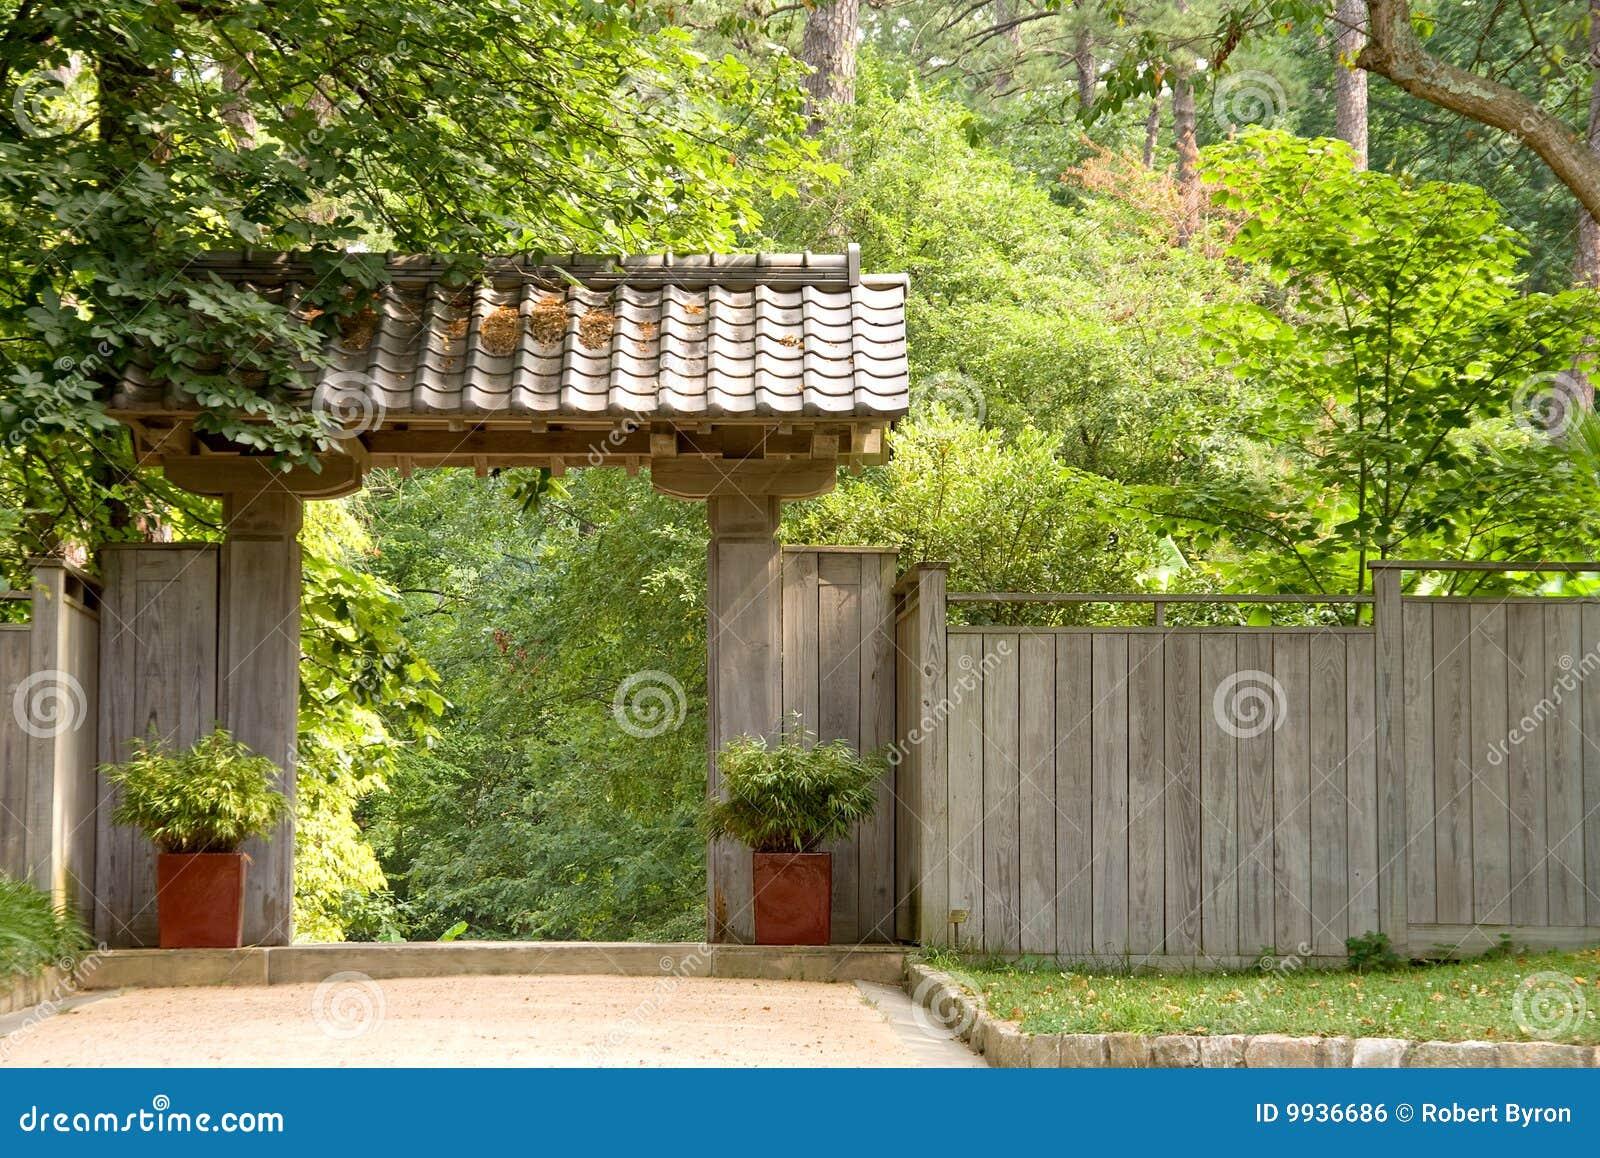 Porte De Jardin Japonaise De Pagoda Photo stock - Image du ...